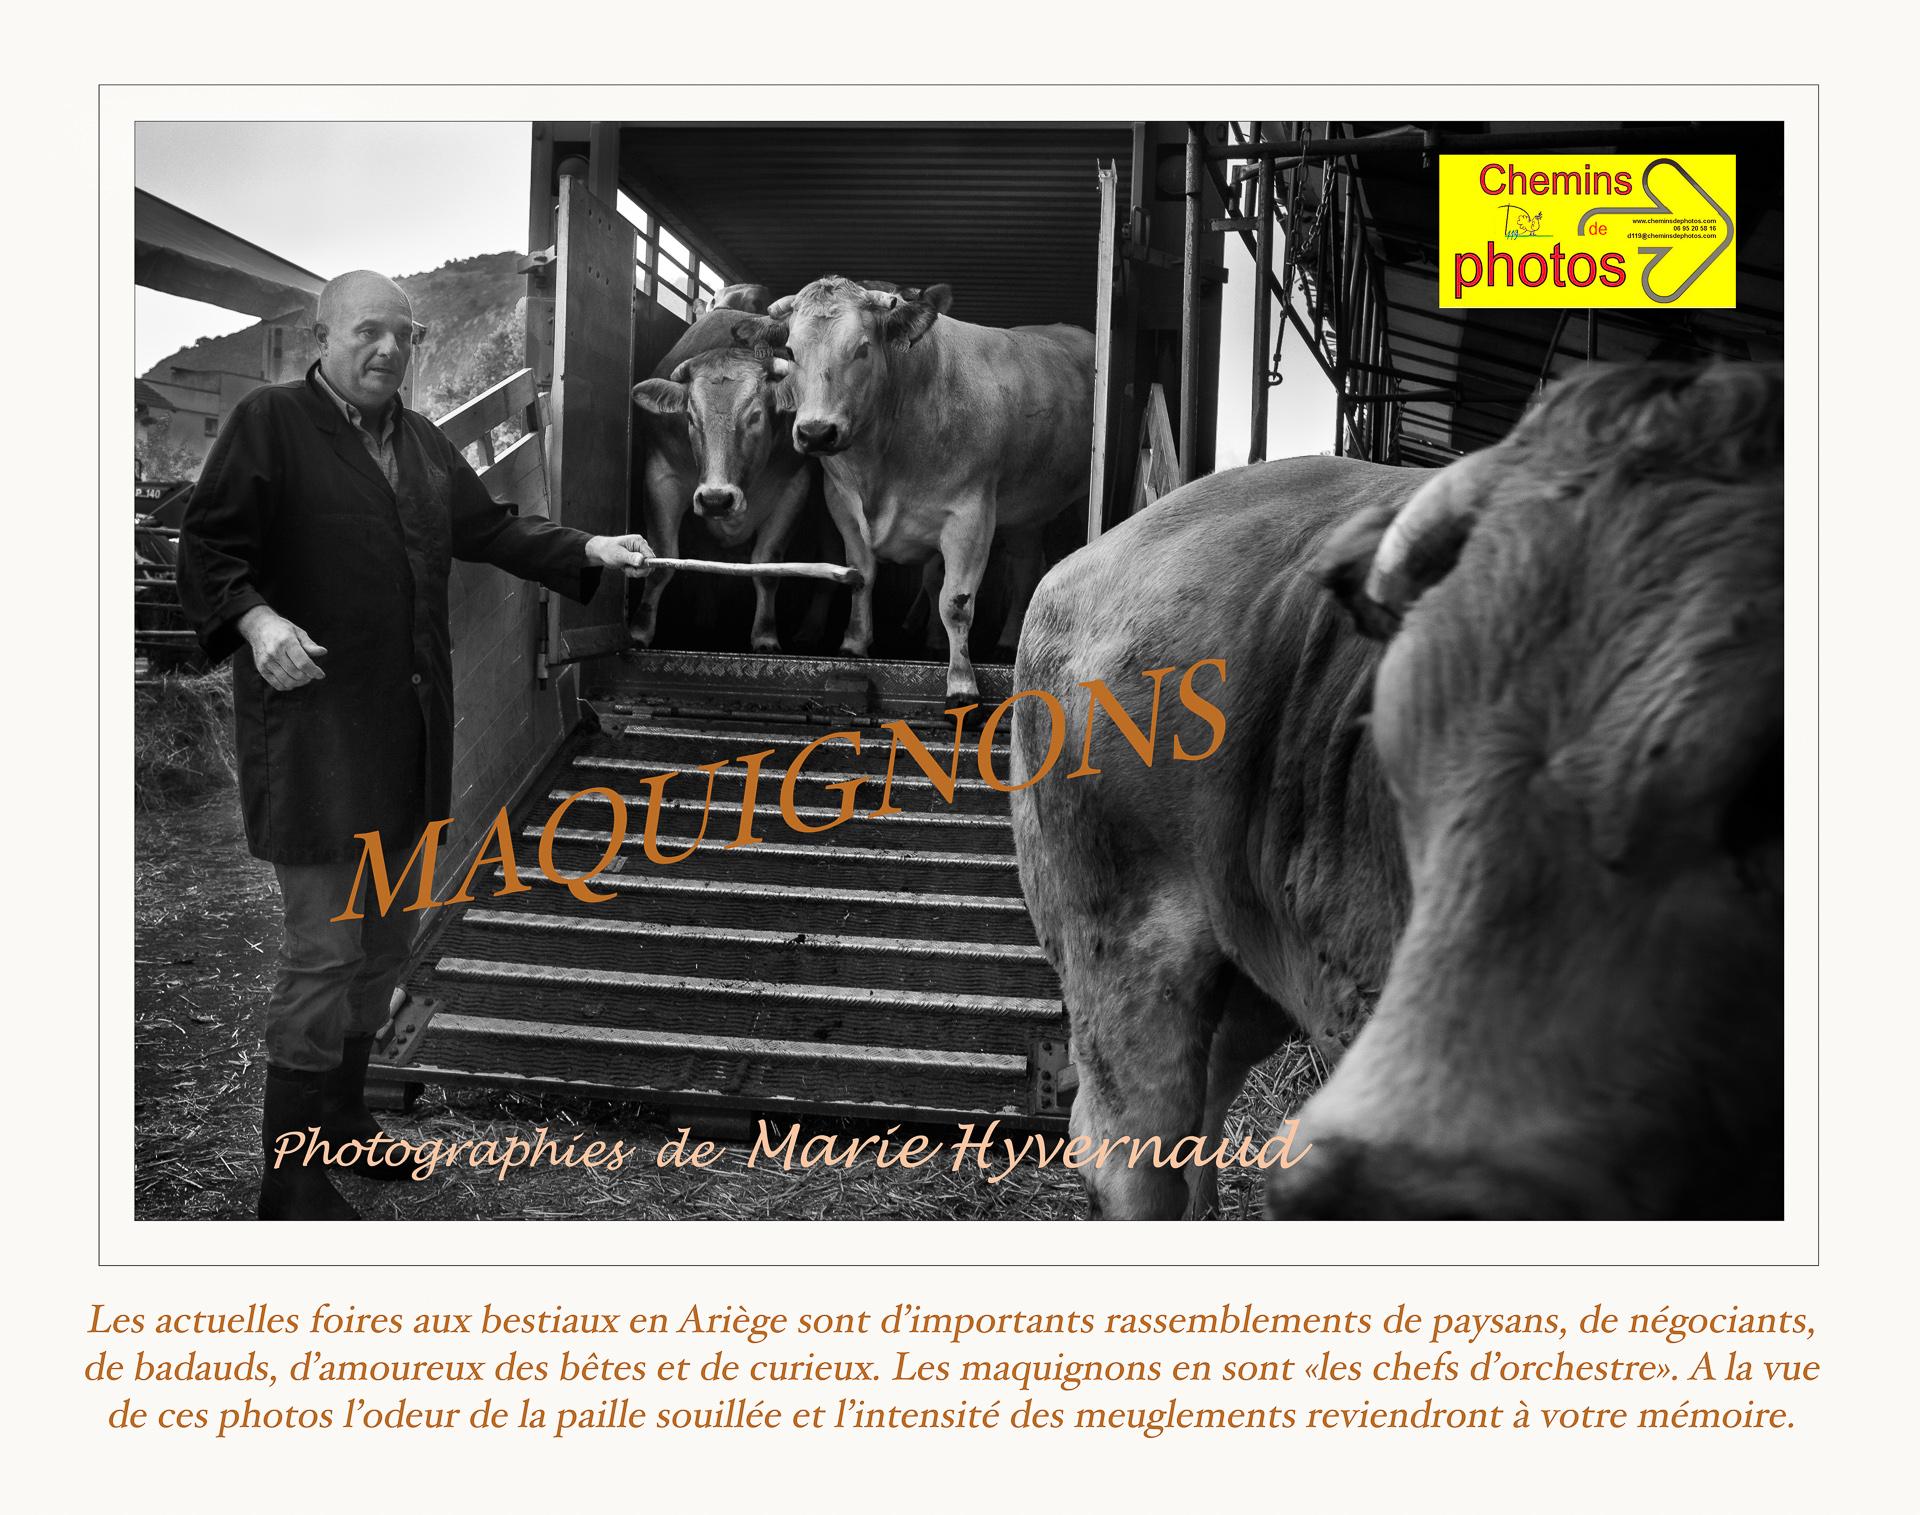 Maquignons - Marie Hyvernaud à Hounoux